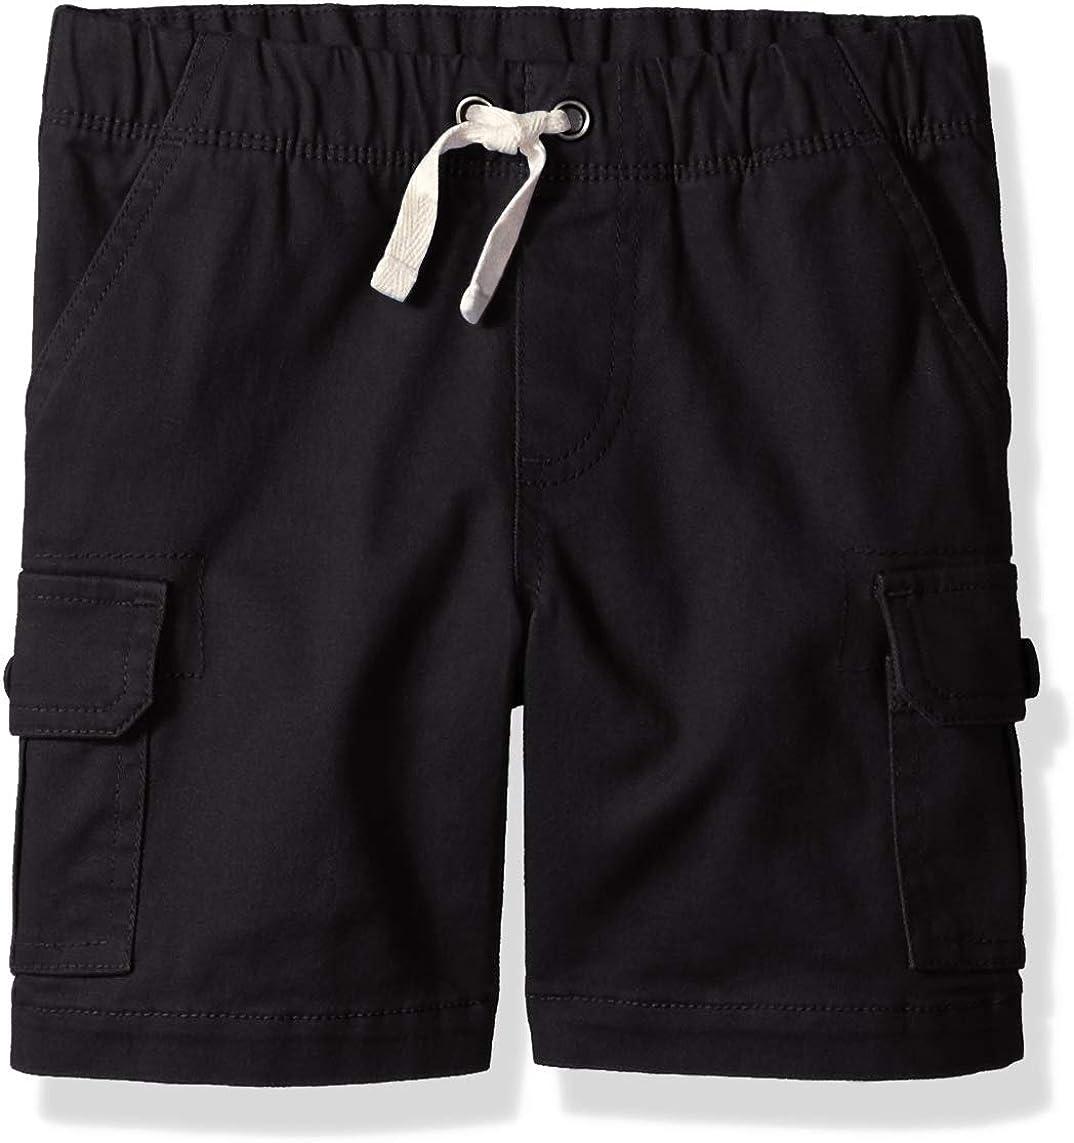 Essentials Boys Cargo Short